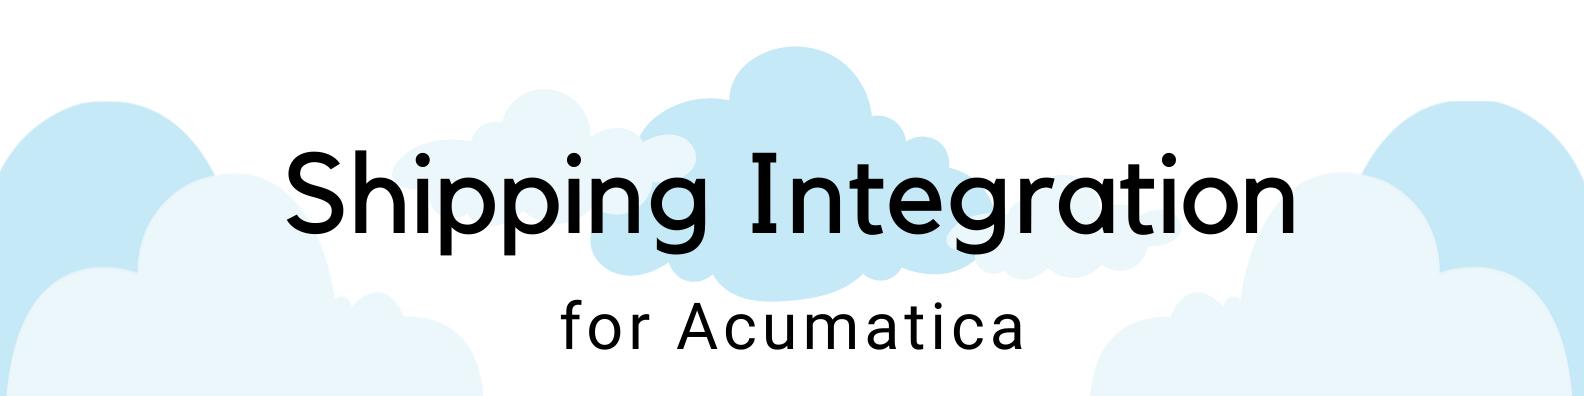 ICAN Shipping Integration for Acumatica header